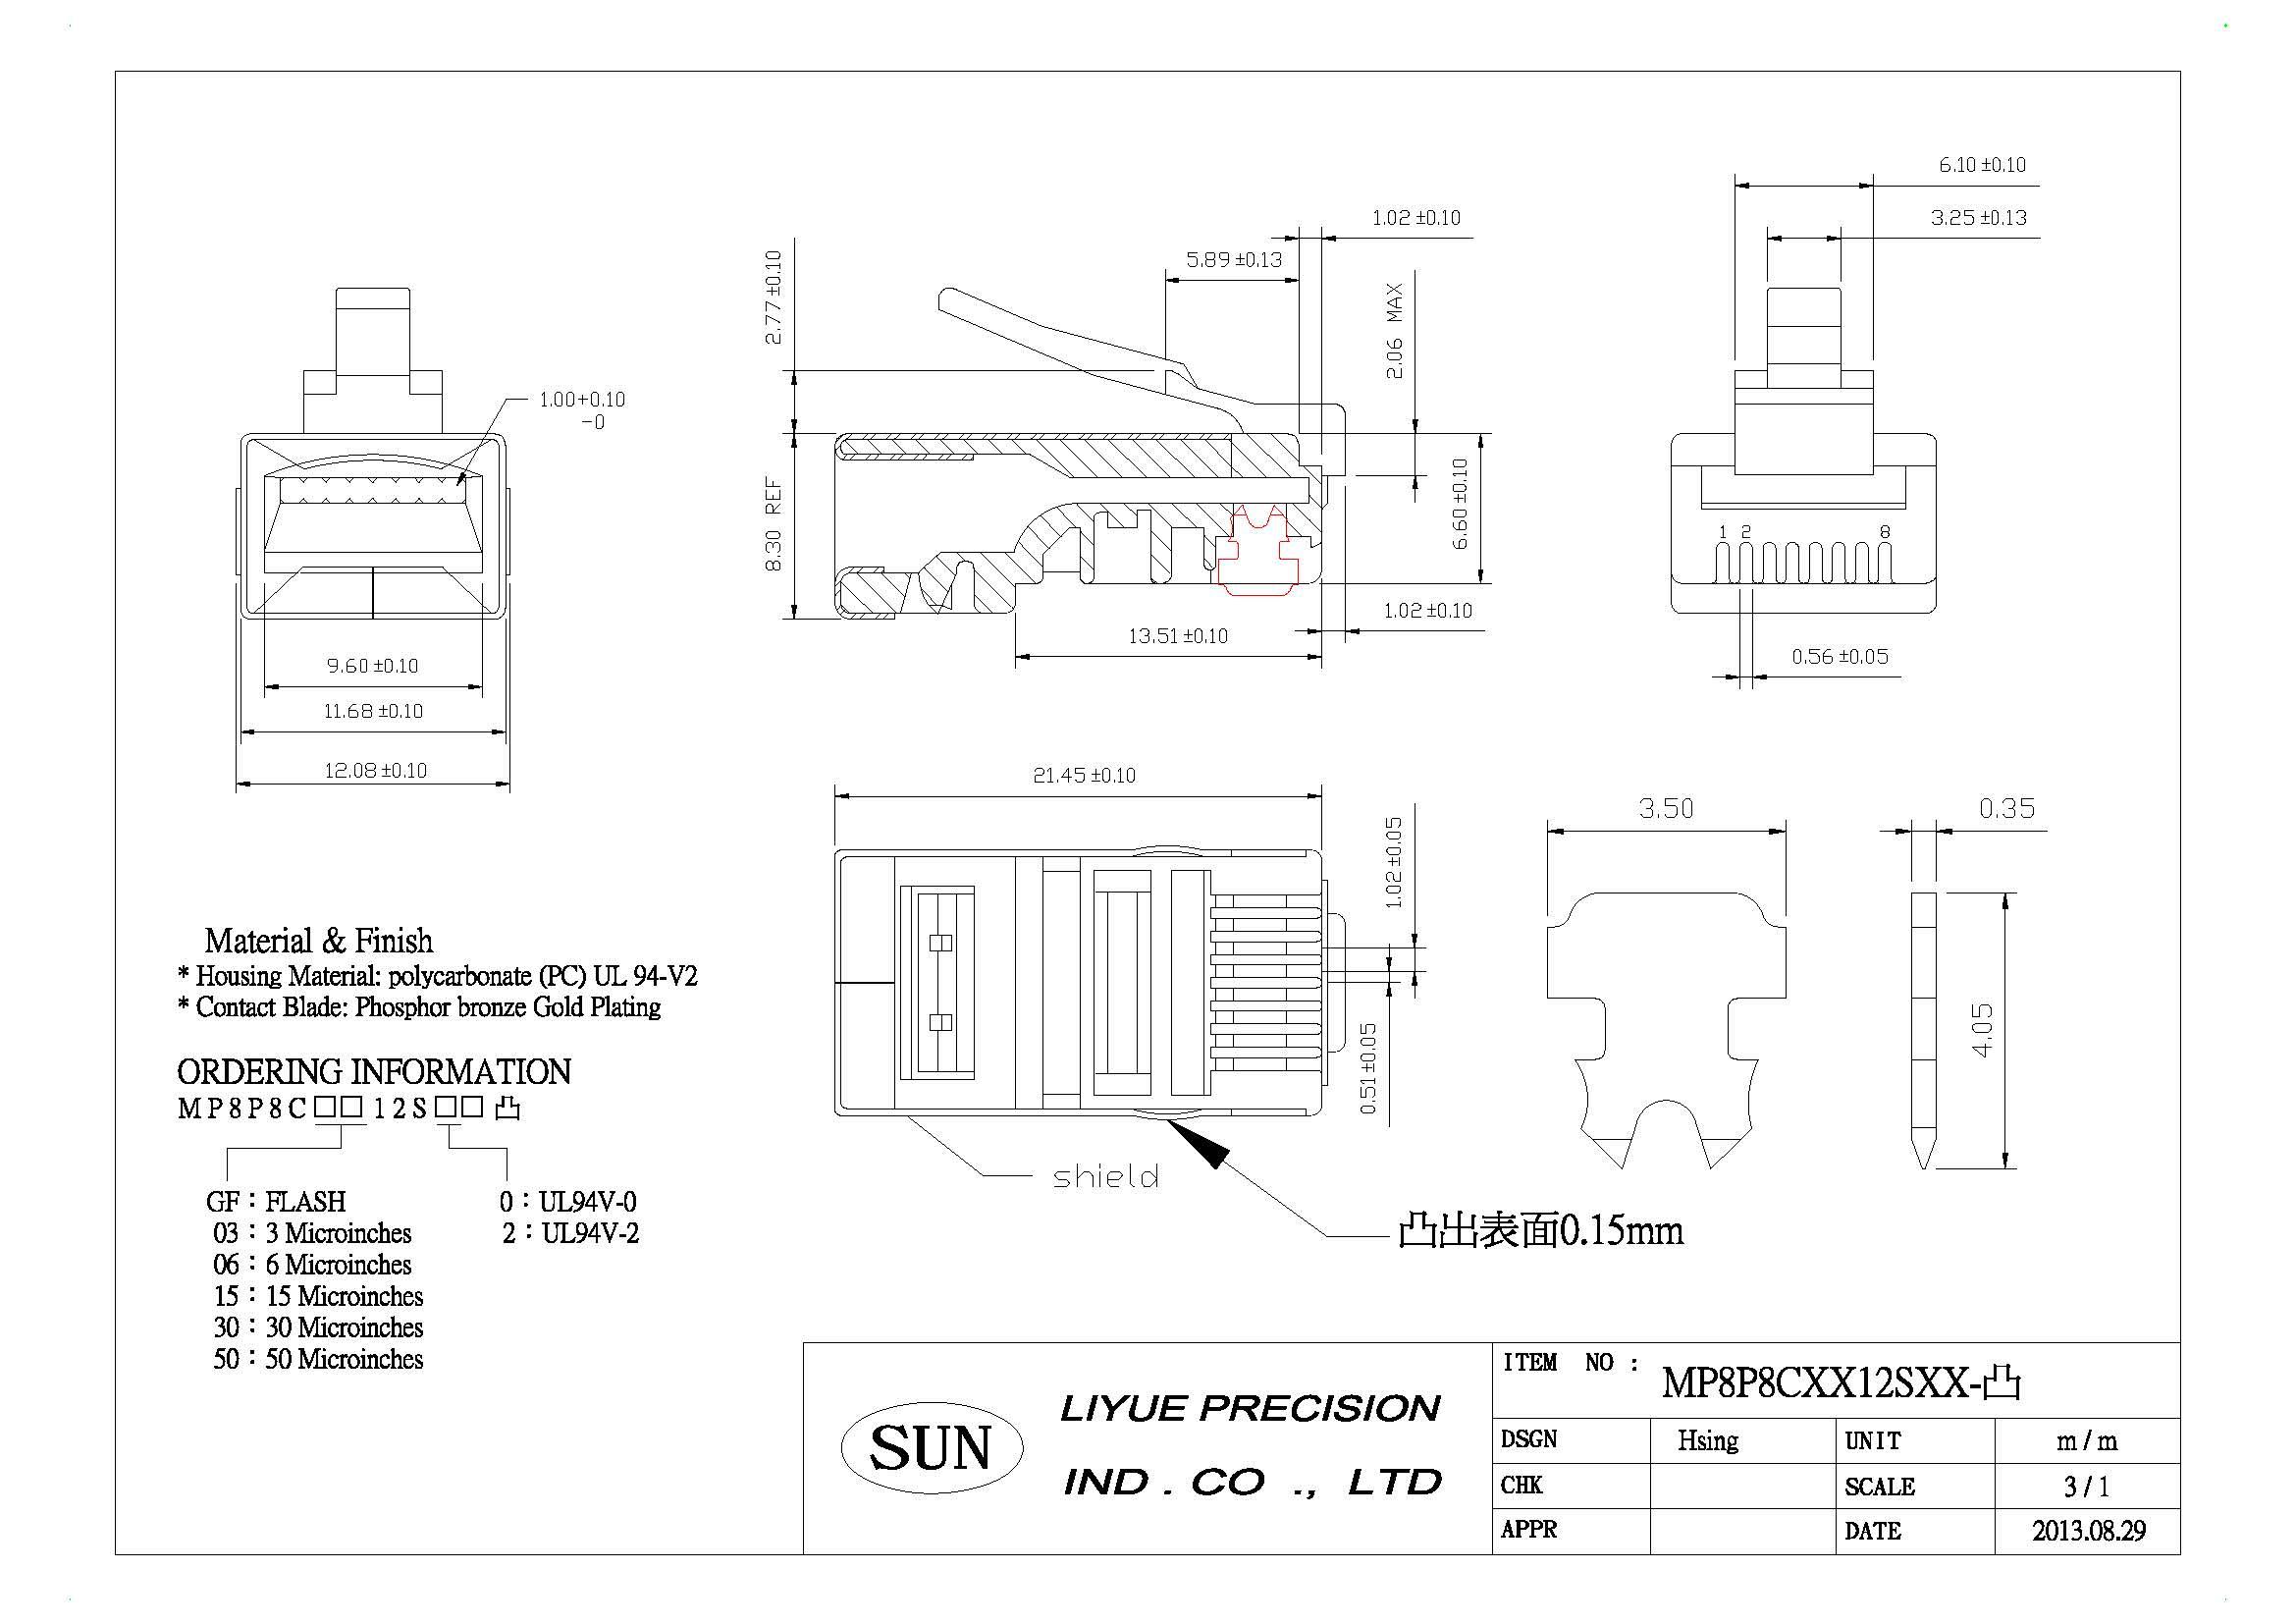 taiwan cat 5e rj45 plug shading reduce sloshing taiwantrade RJ 45 Lan cat 5e rj45 plug shading reduce sloshing